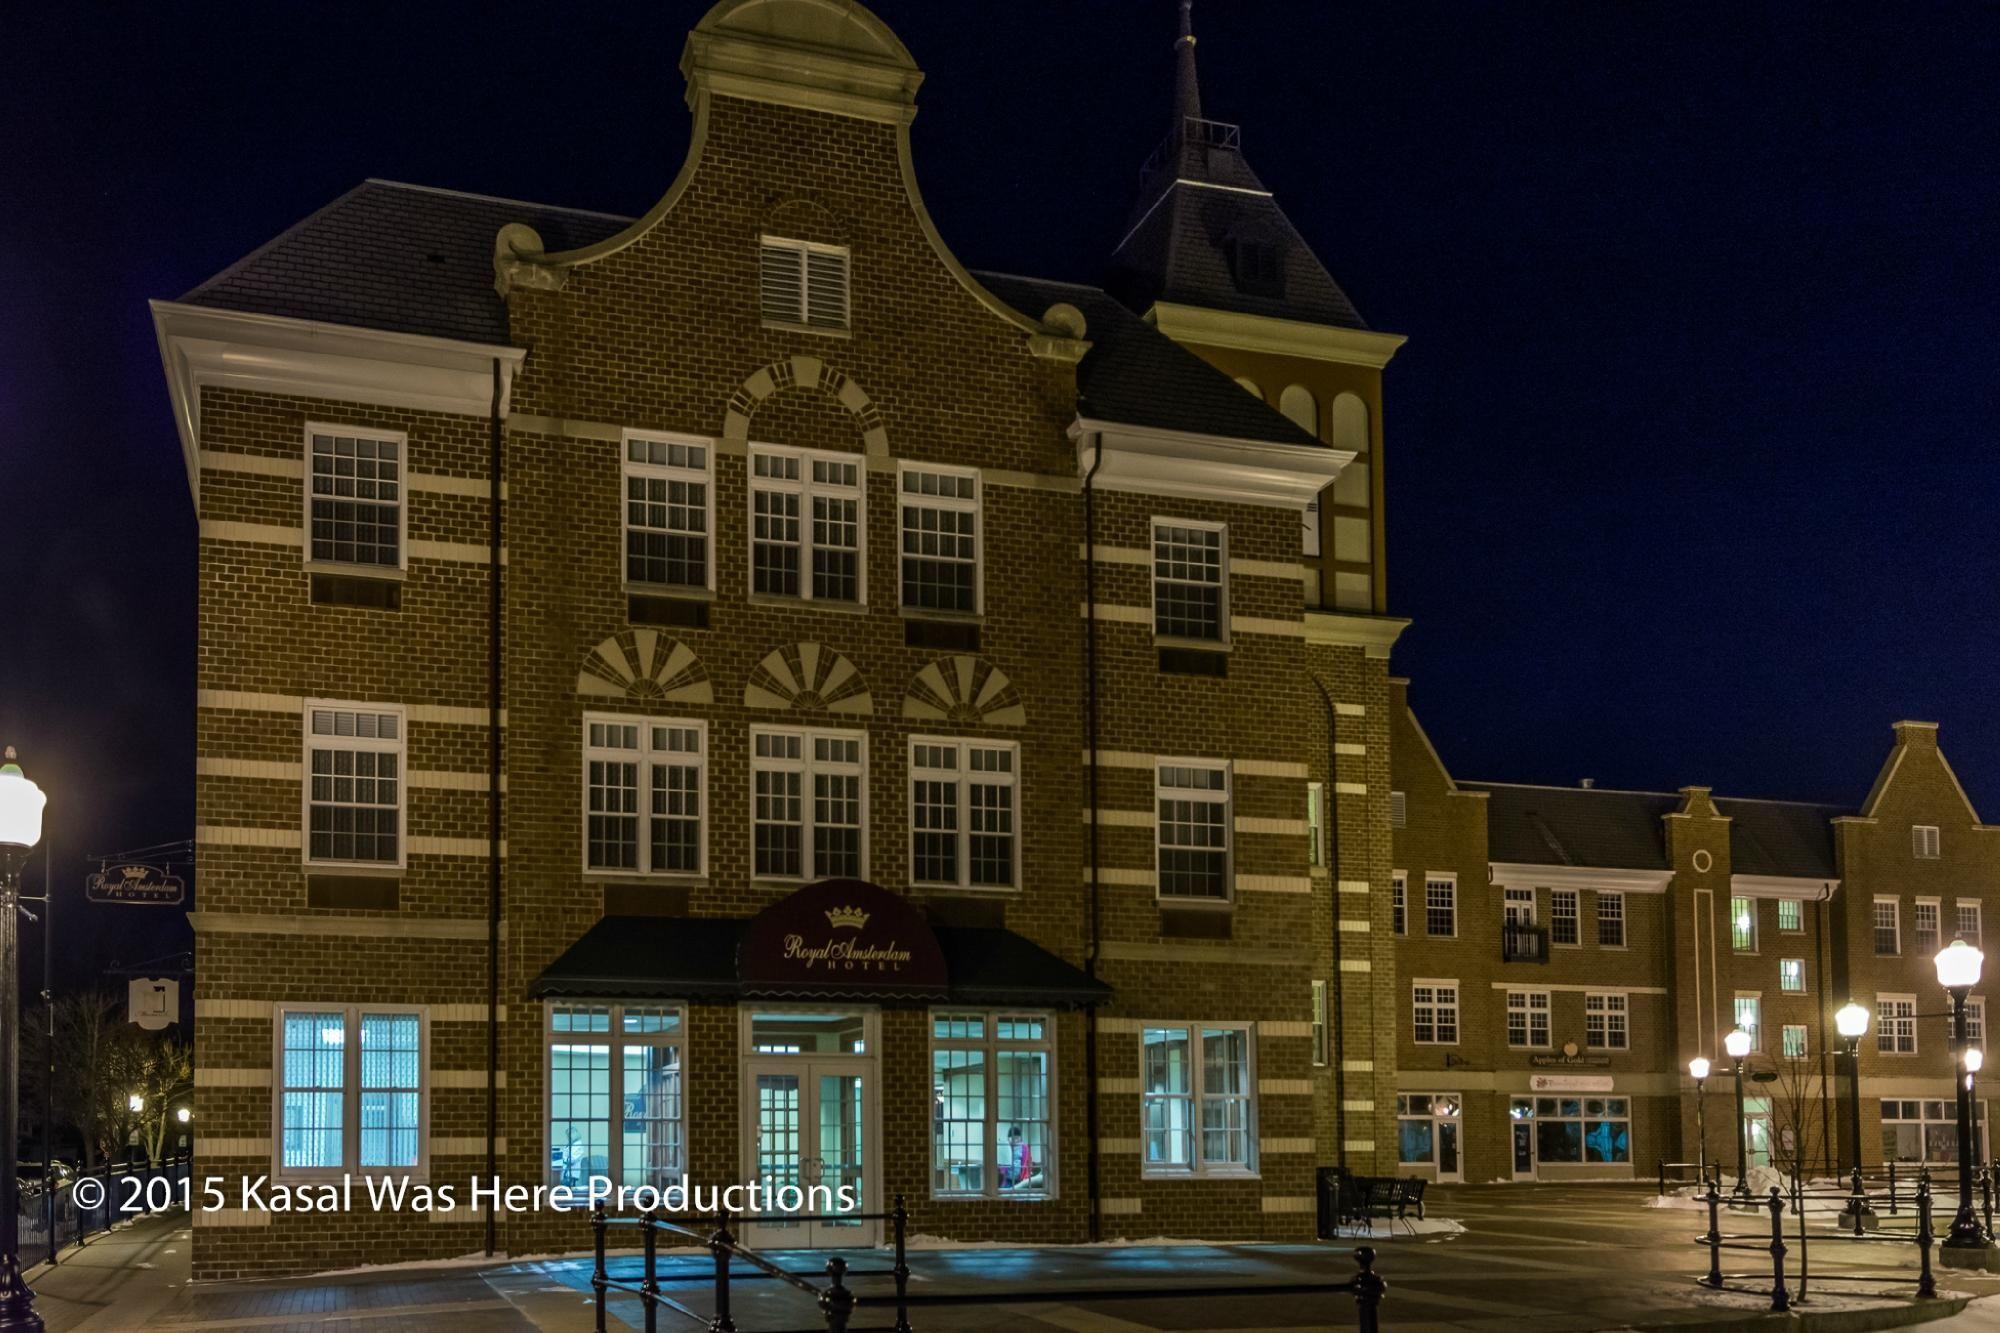 Royal Amsterdam Hotel Reviews Deals Pella Ia Tripadvisor